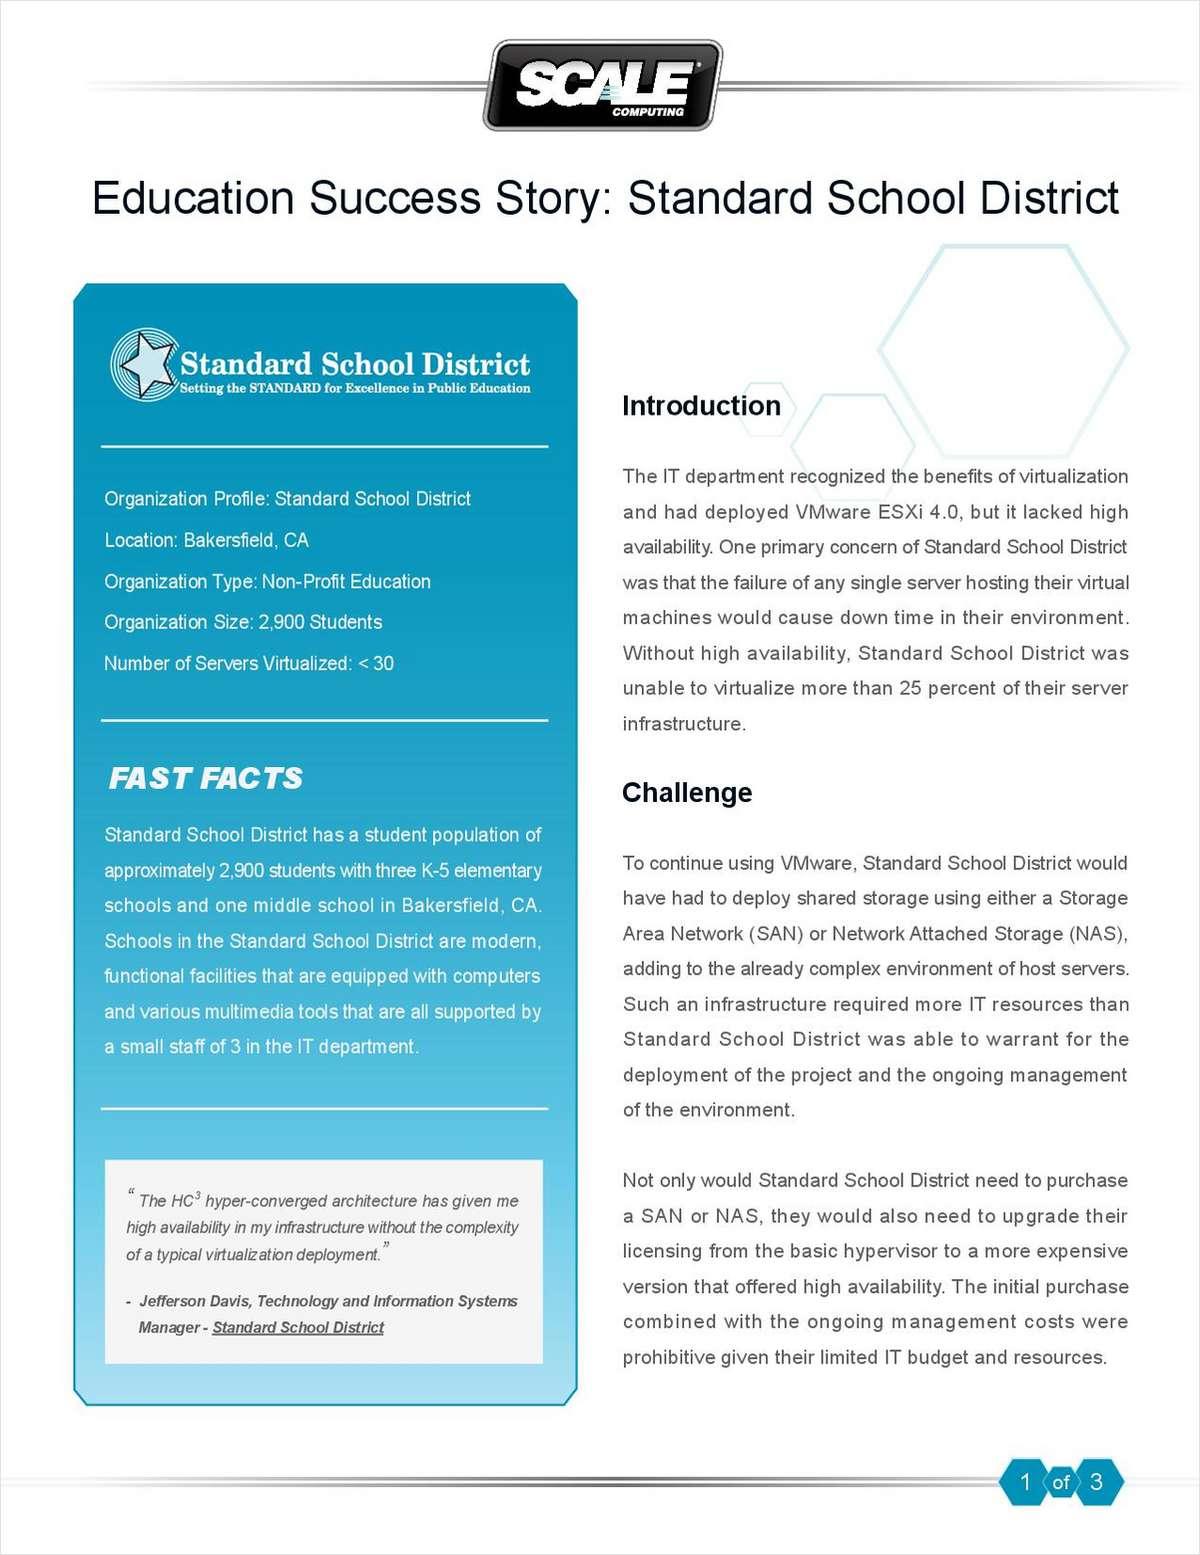 Education Success Story: Standard School District